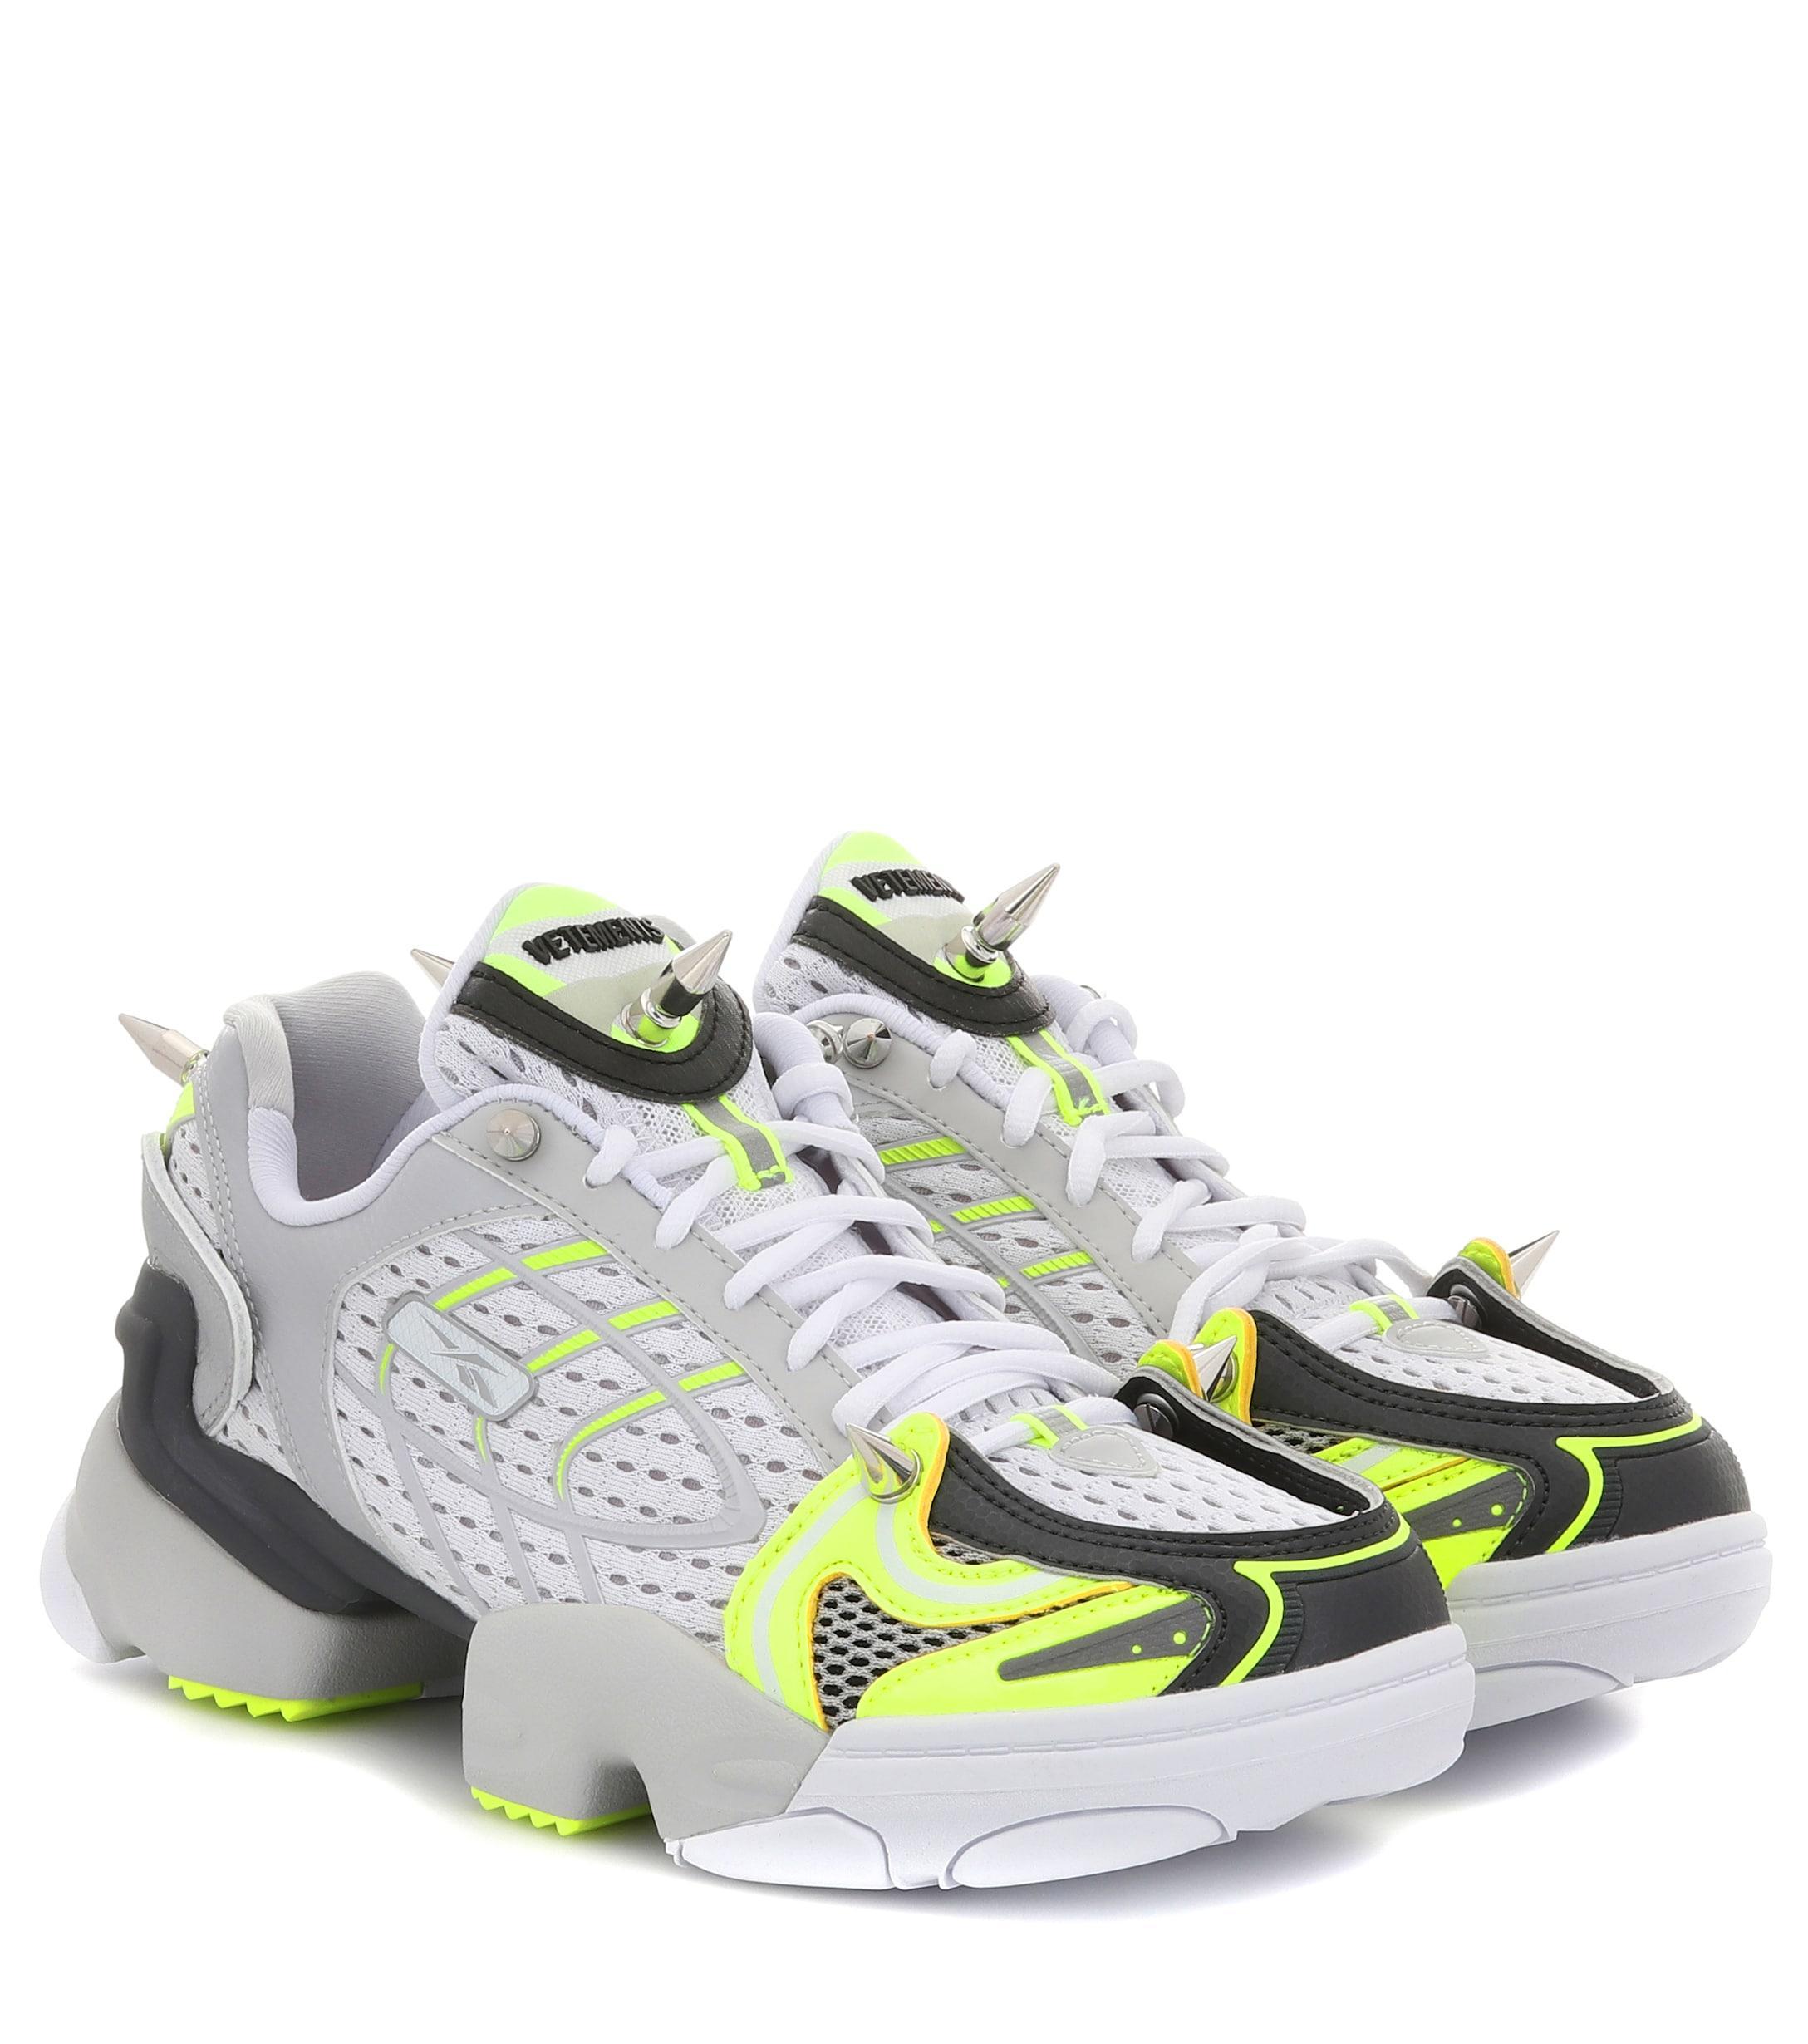 8cfc9796ccac Vetements X Reebok Running Sneakers - Reebok Of Ceside.Co